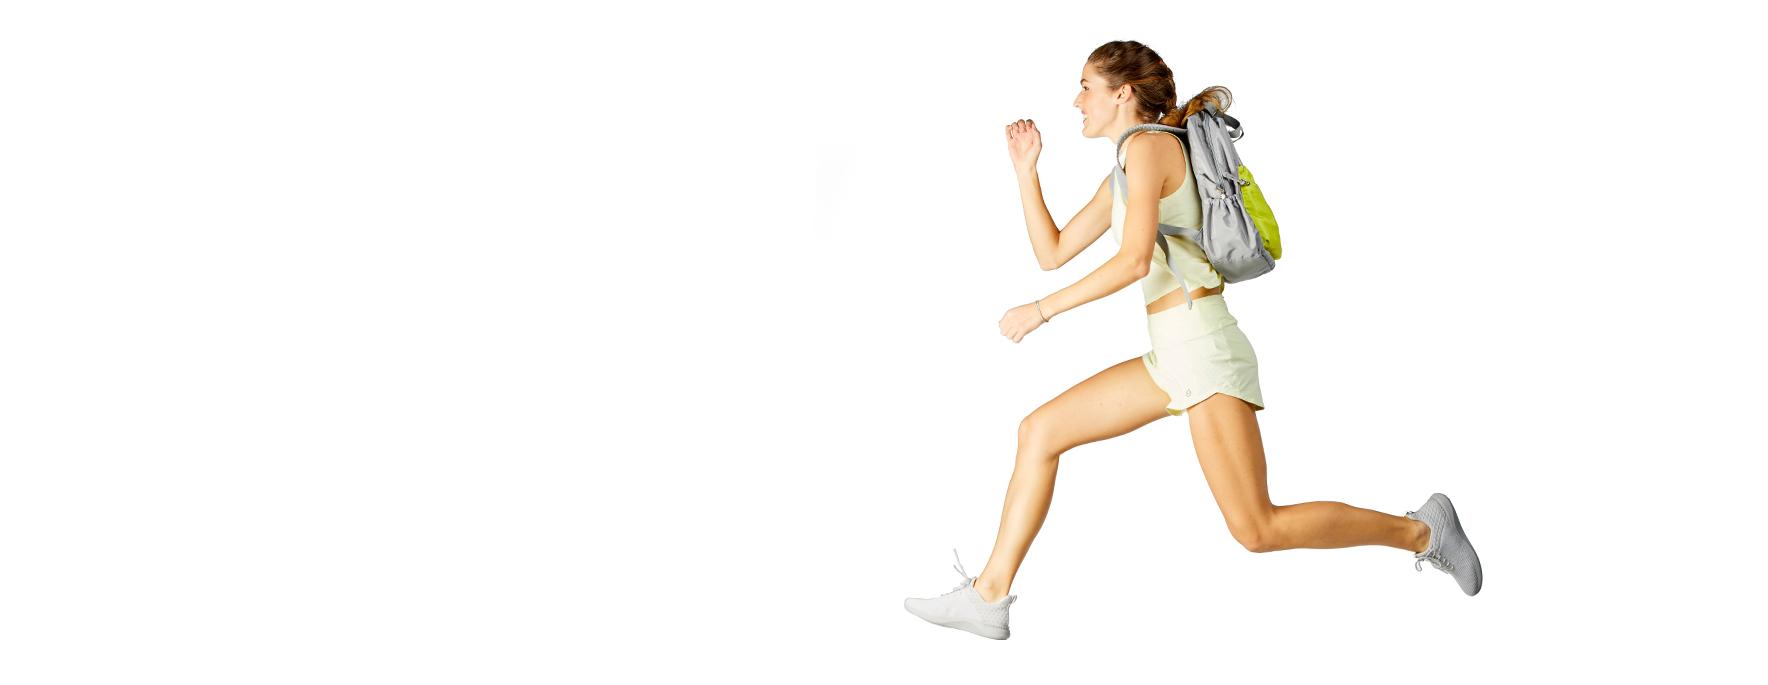 Women's running collection - women's performance running clothing by tasc Performance